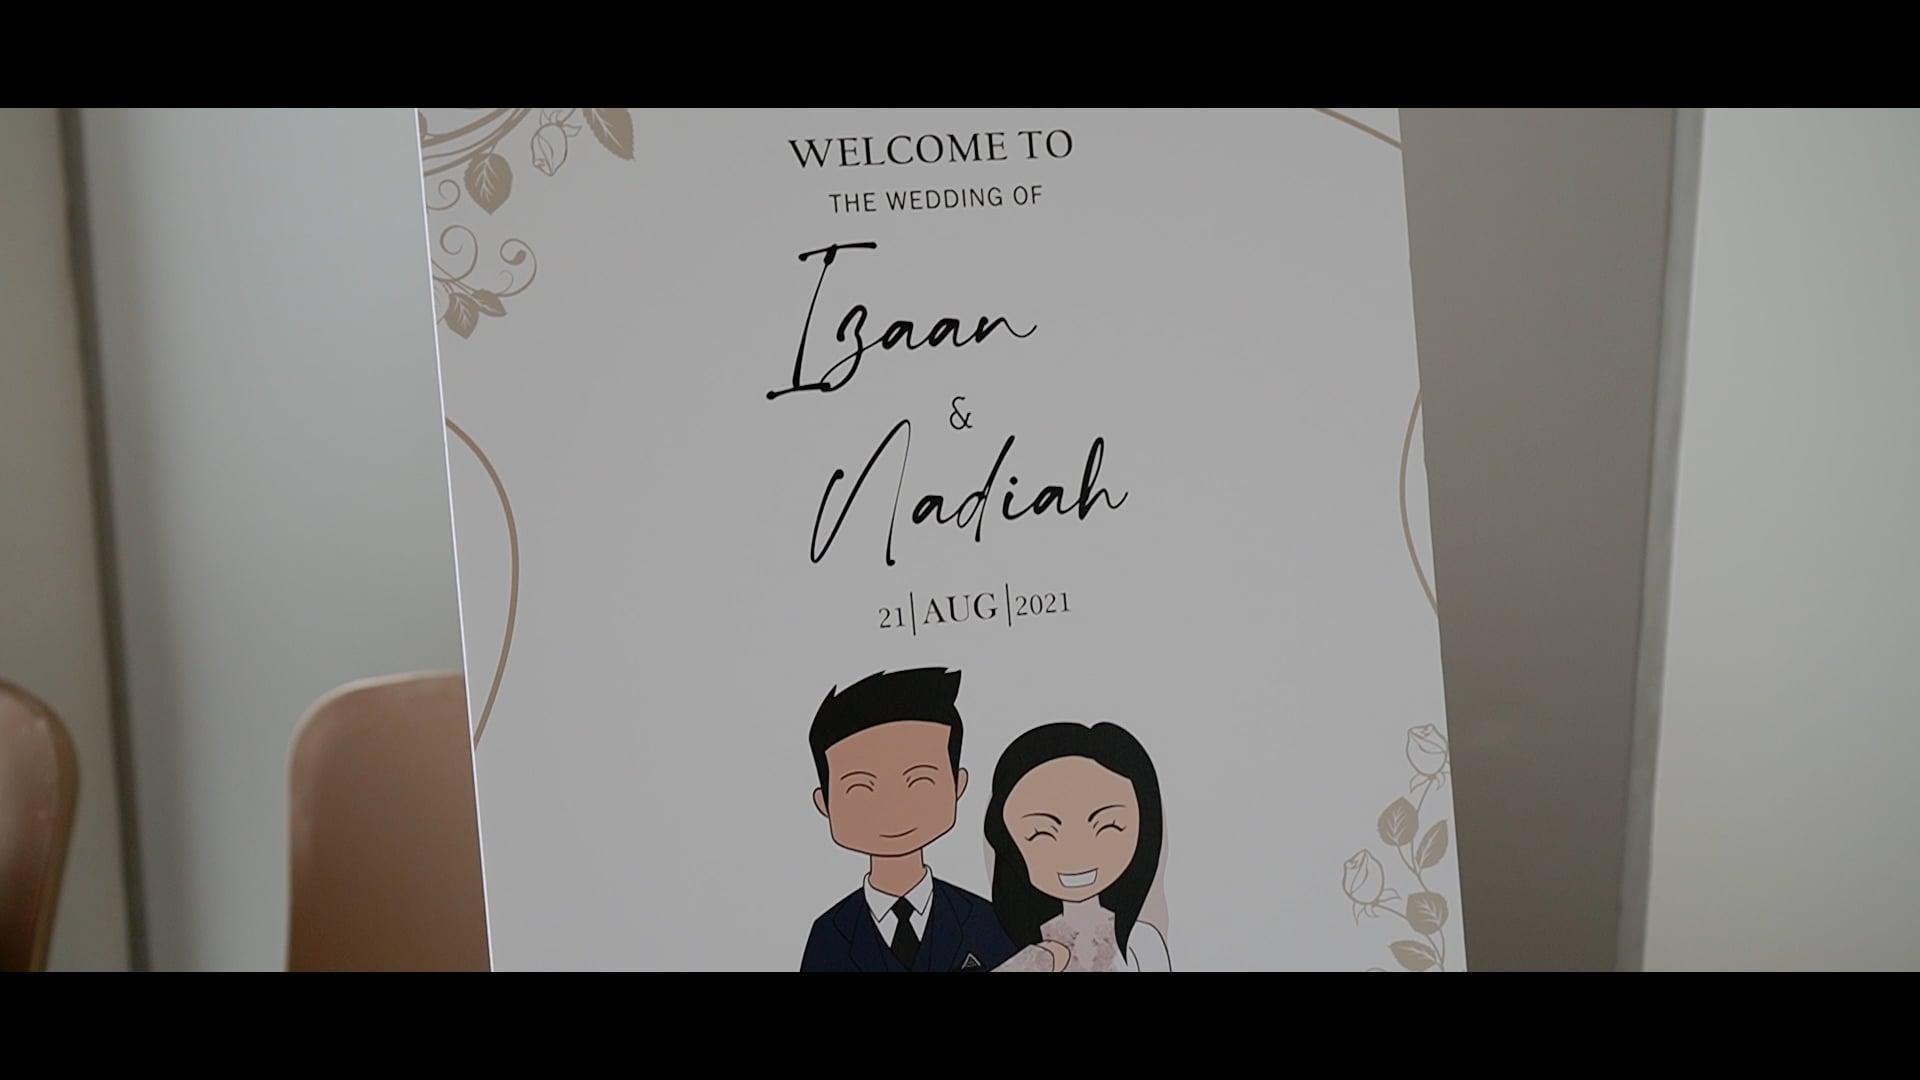 The wedding highlights of Izaan & Nadiah - 22nd August 2021 v2